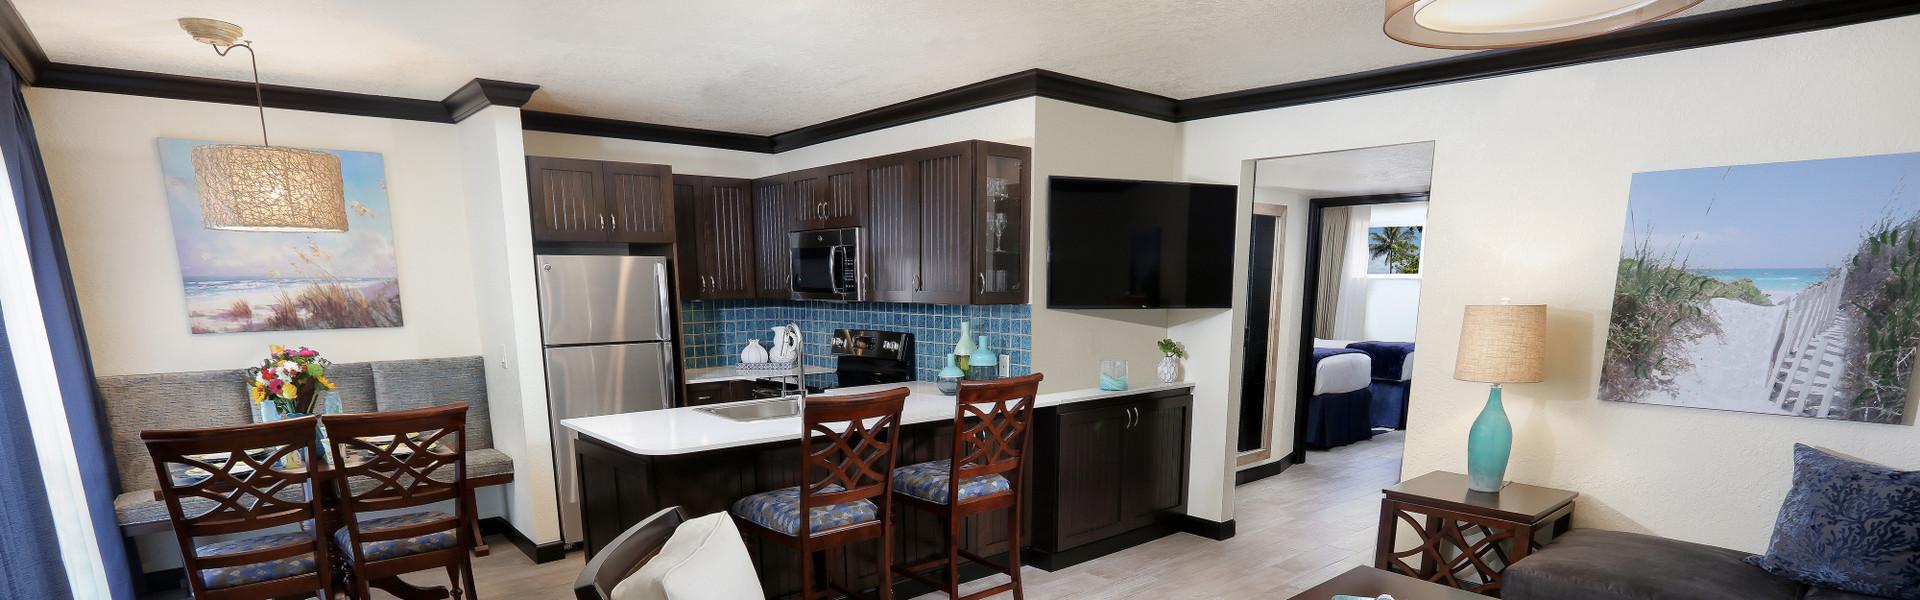 2 Bedroom Suites at Cocoa Beach Oceanfront Hotel near Cocoa Beach and Westgate Cocoa Beach Pier